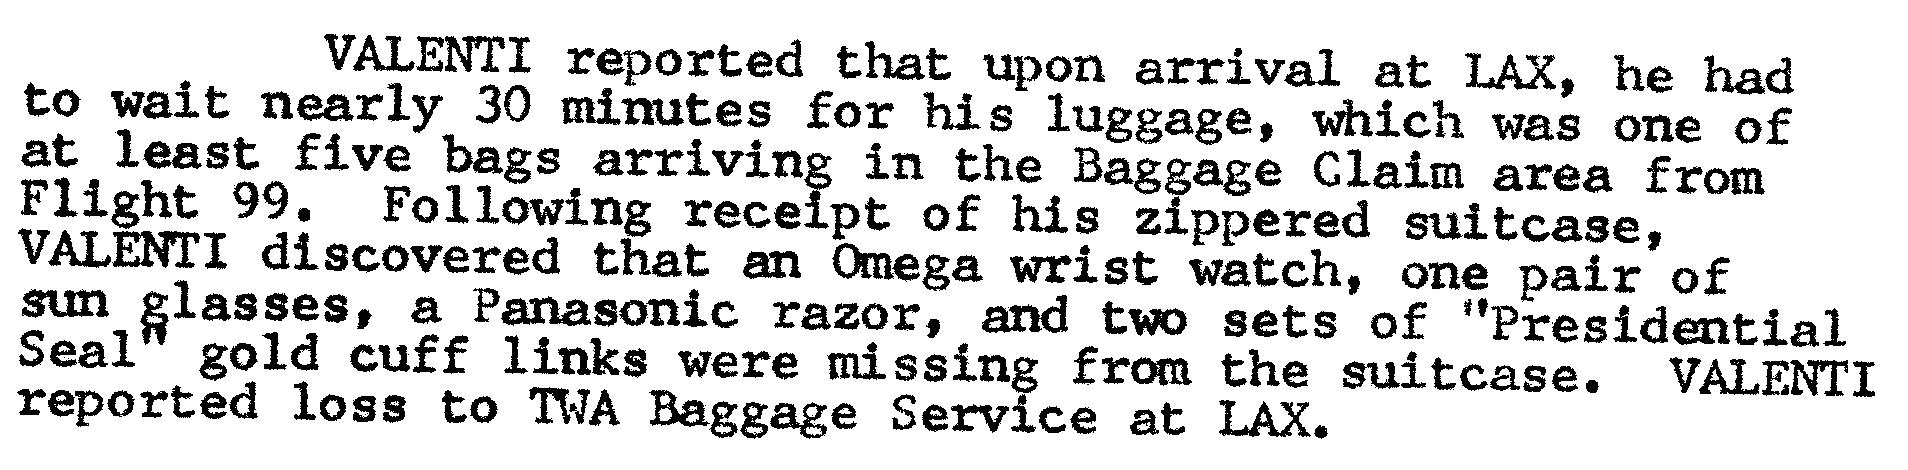 FBI-Valenti-StolenLuggage